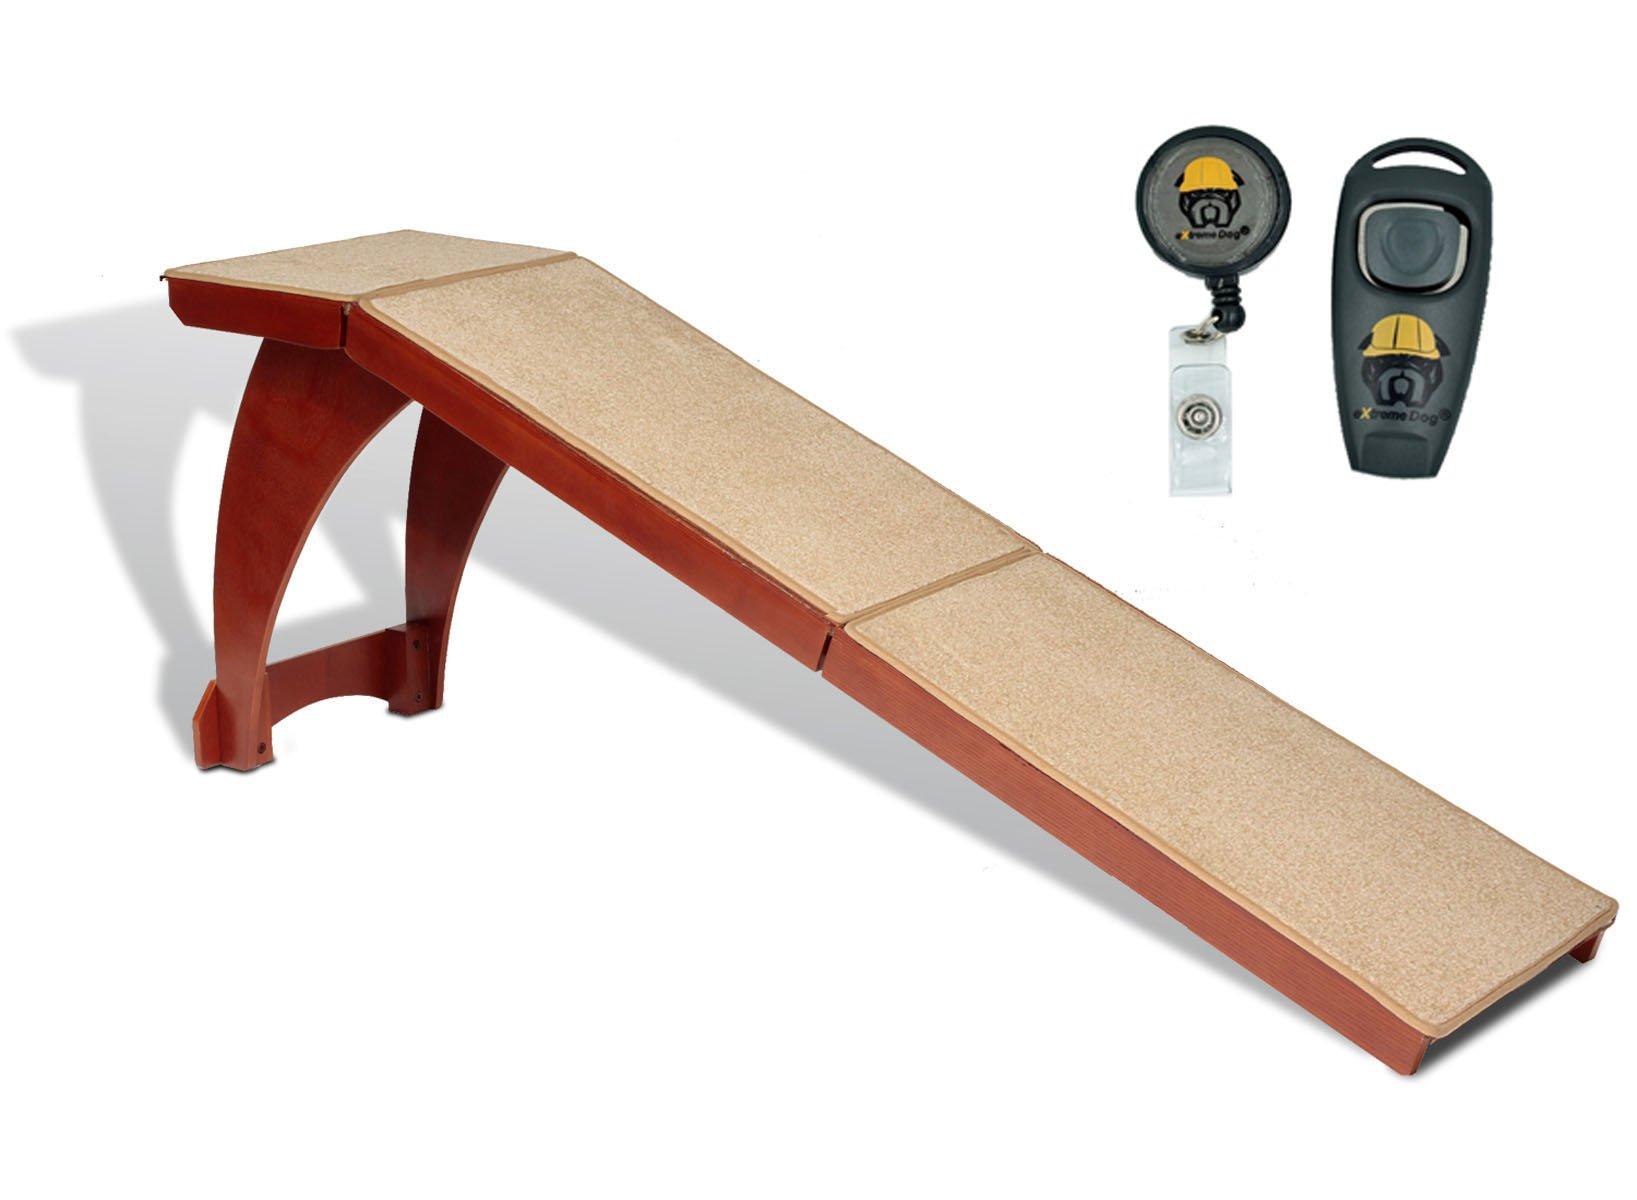 Solvit Wood Bedside Ramp with FREE Dog Training Clicker Bundle